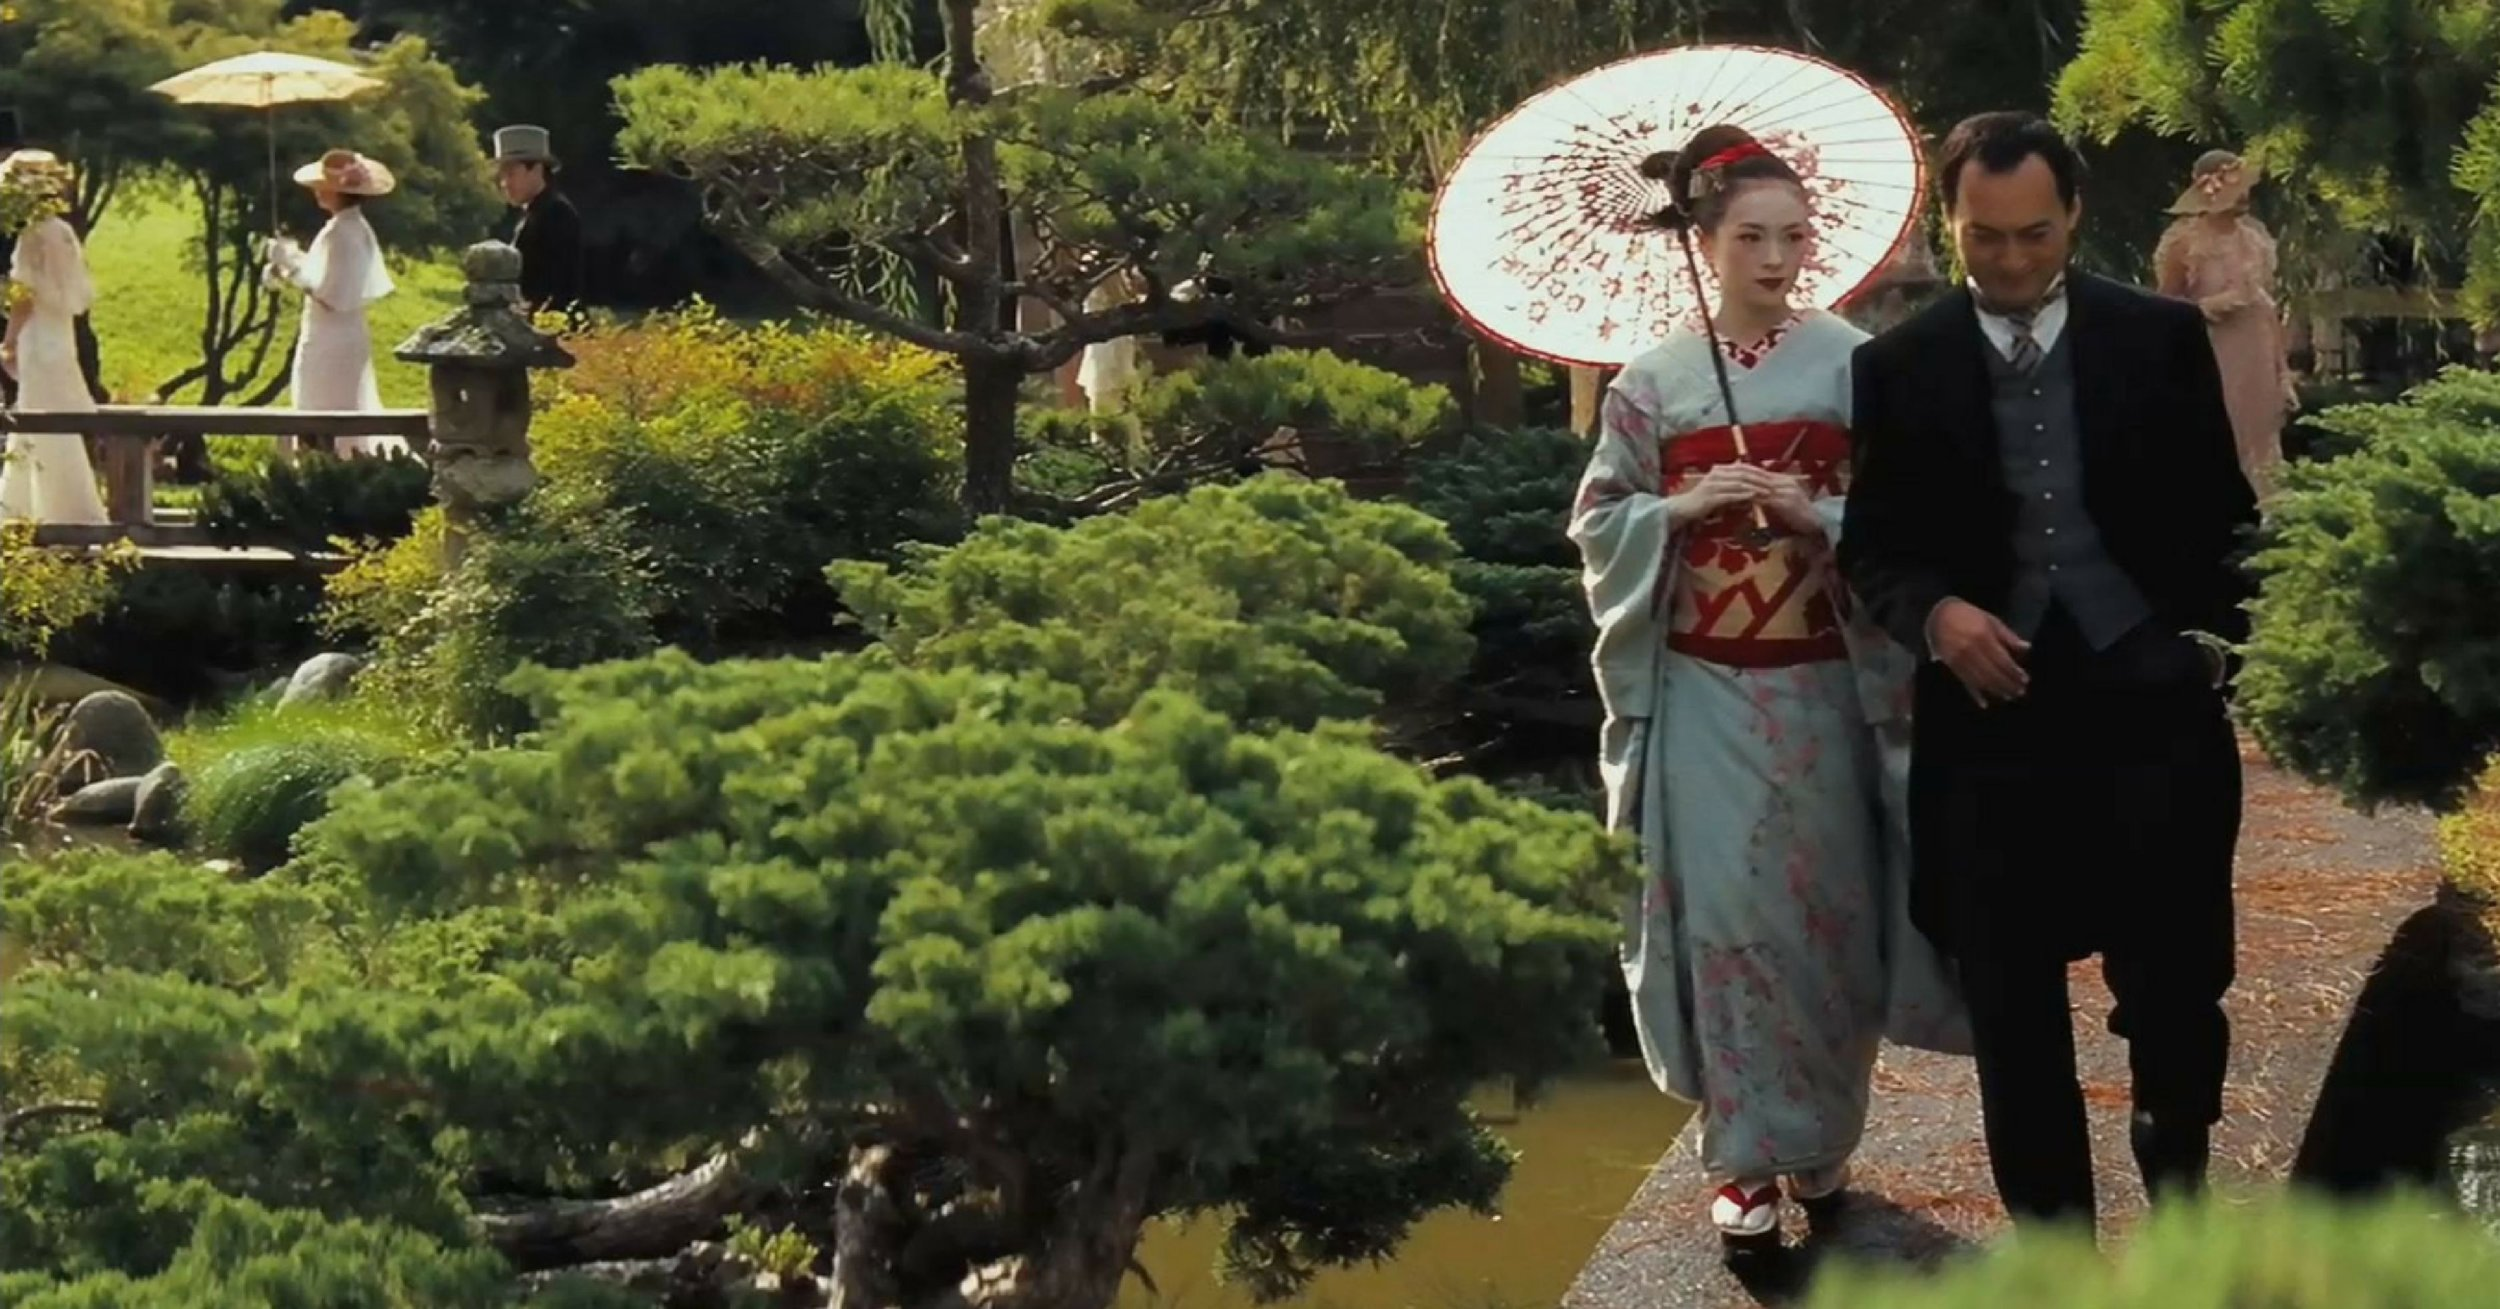 FB-Image-Memoirs-of-a-Geisha.jpg